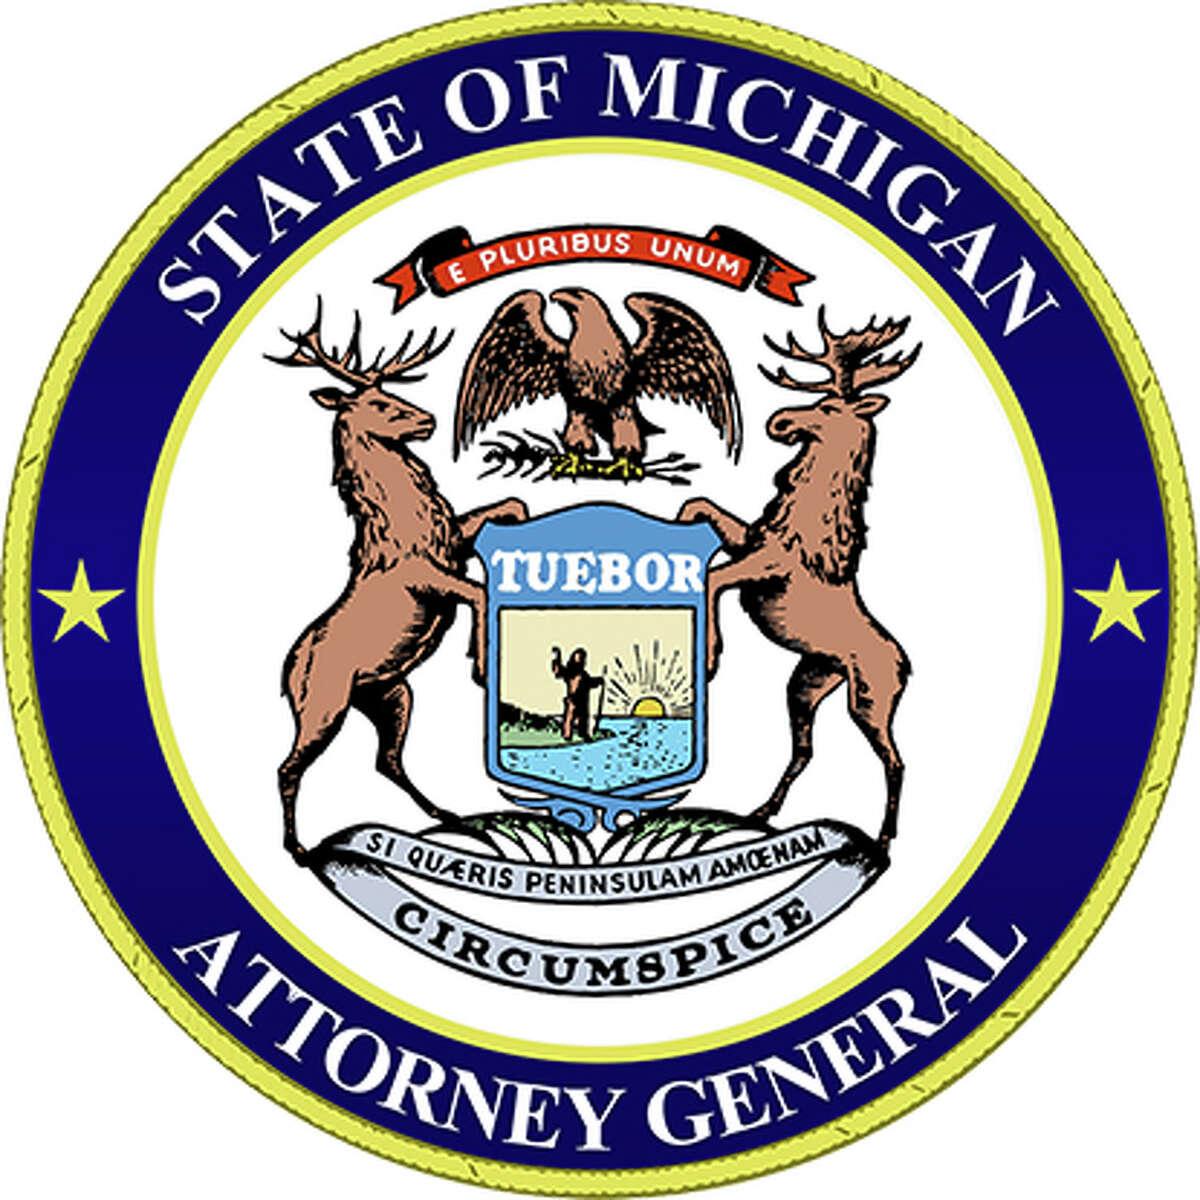 Michigan Attorney General's Office